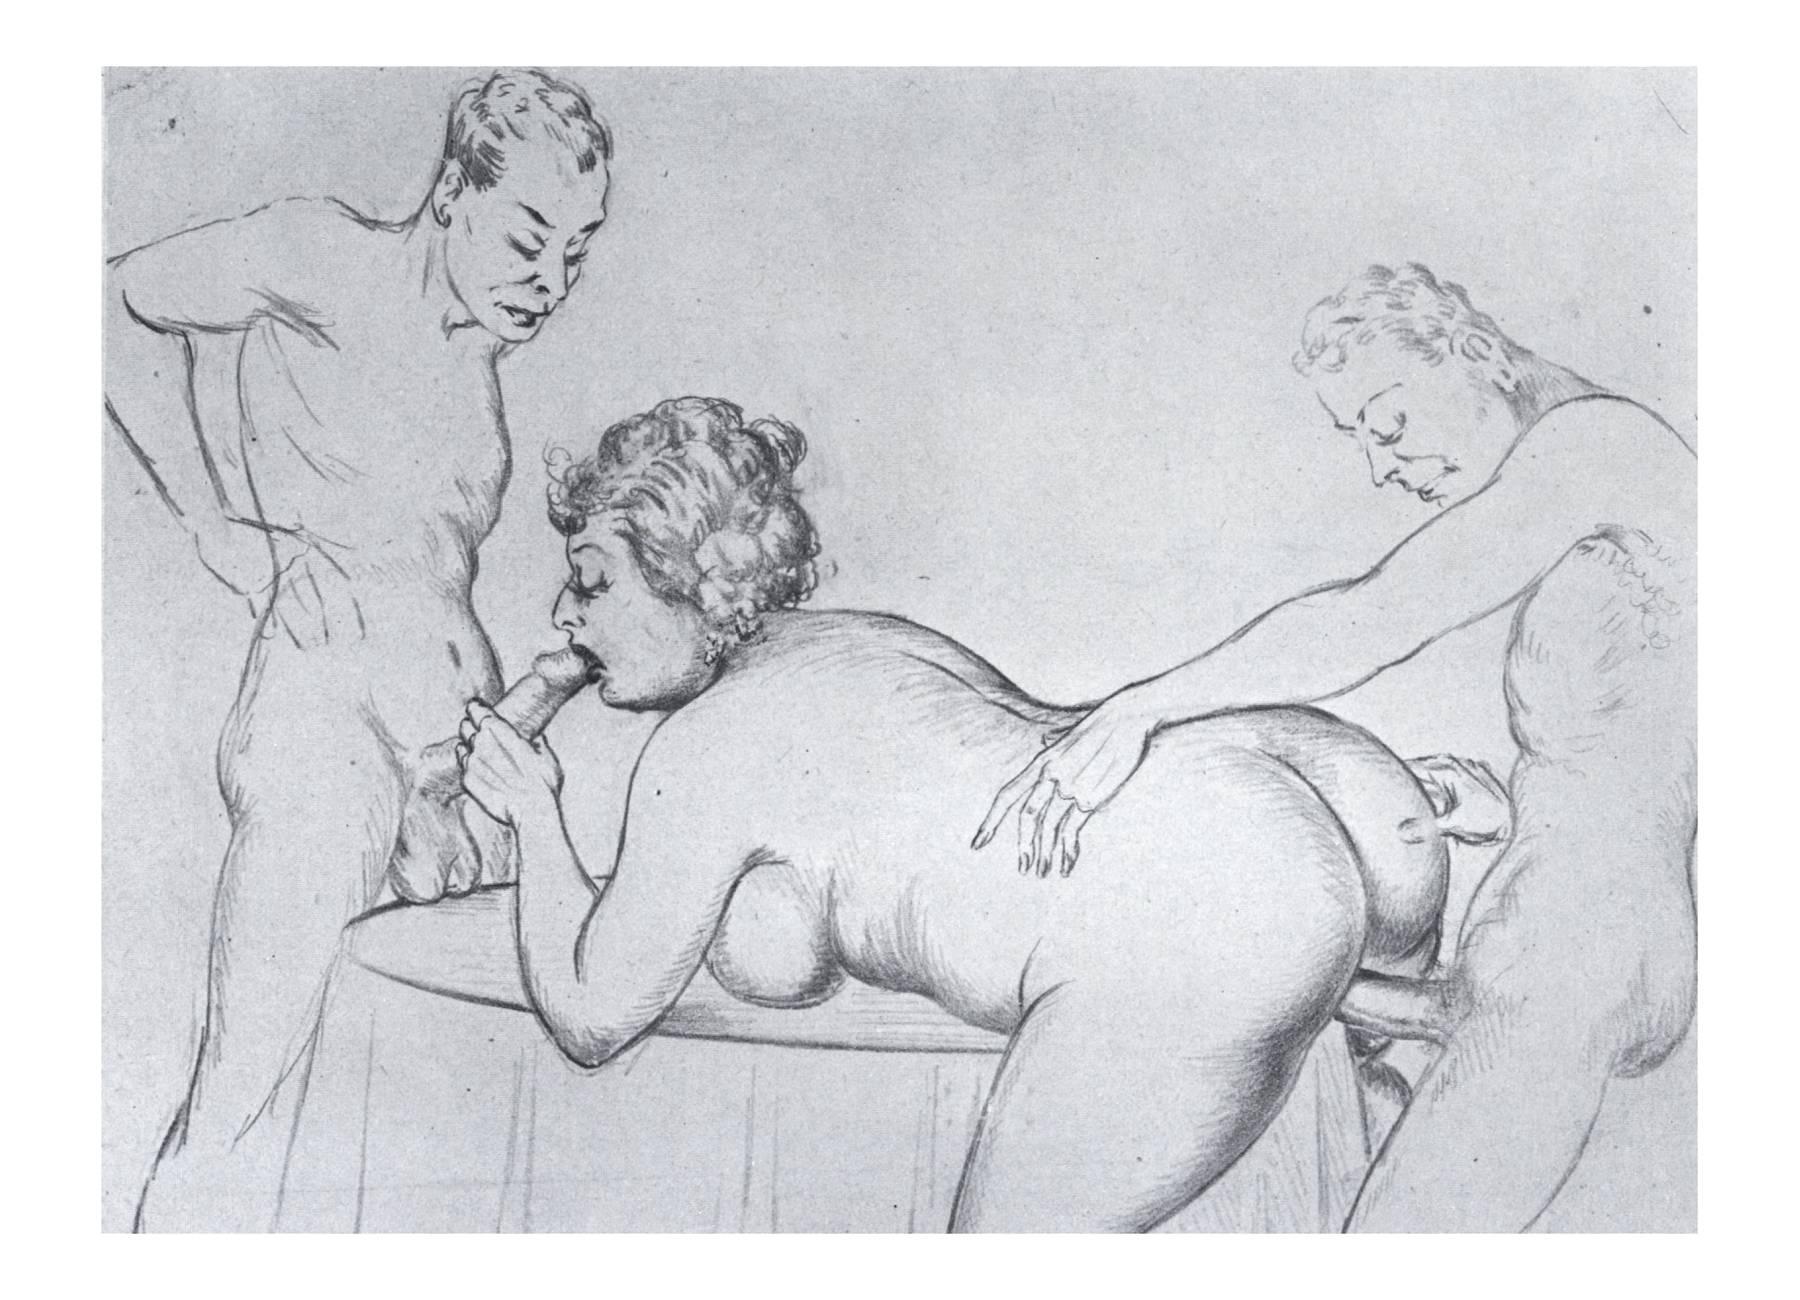 Erotic hardcore fucking drawings erotic film